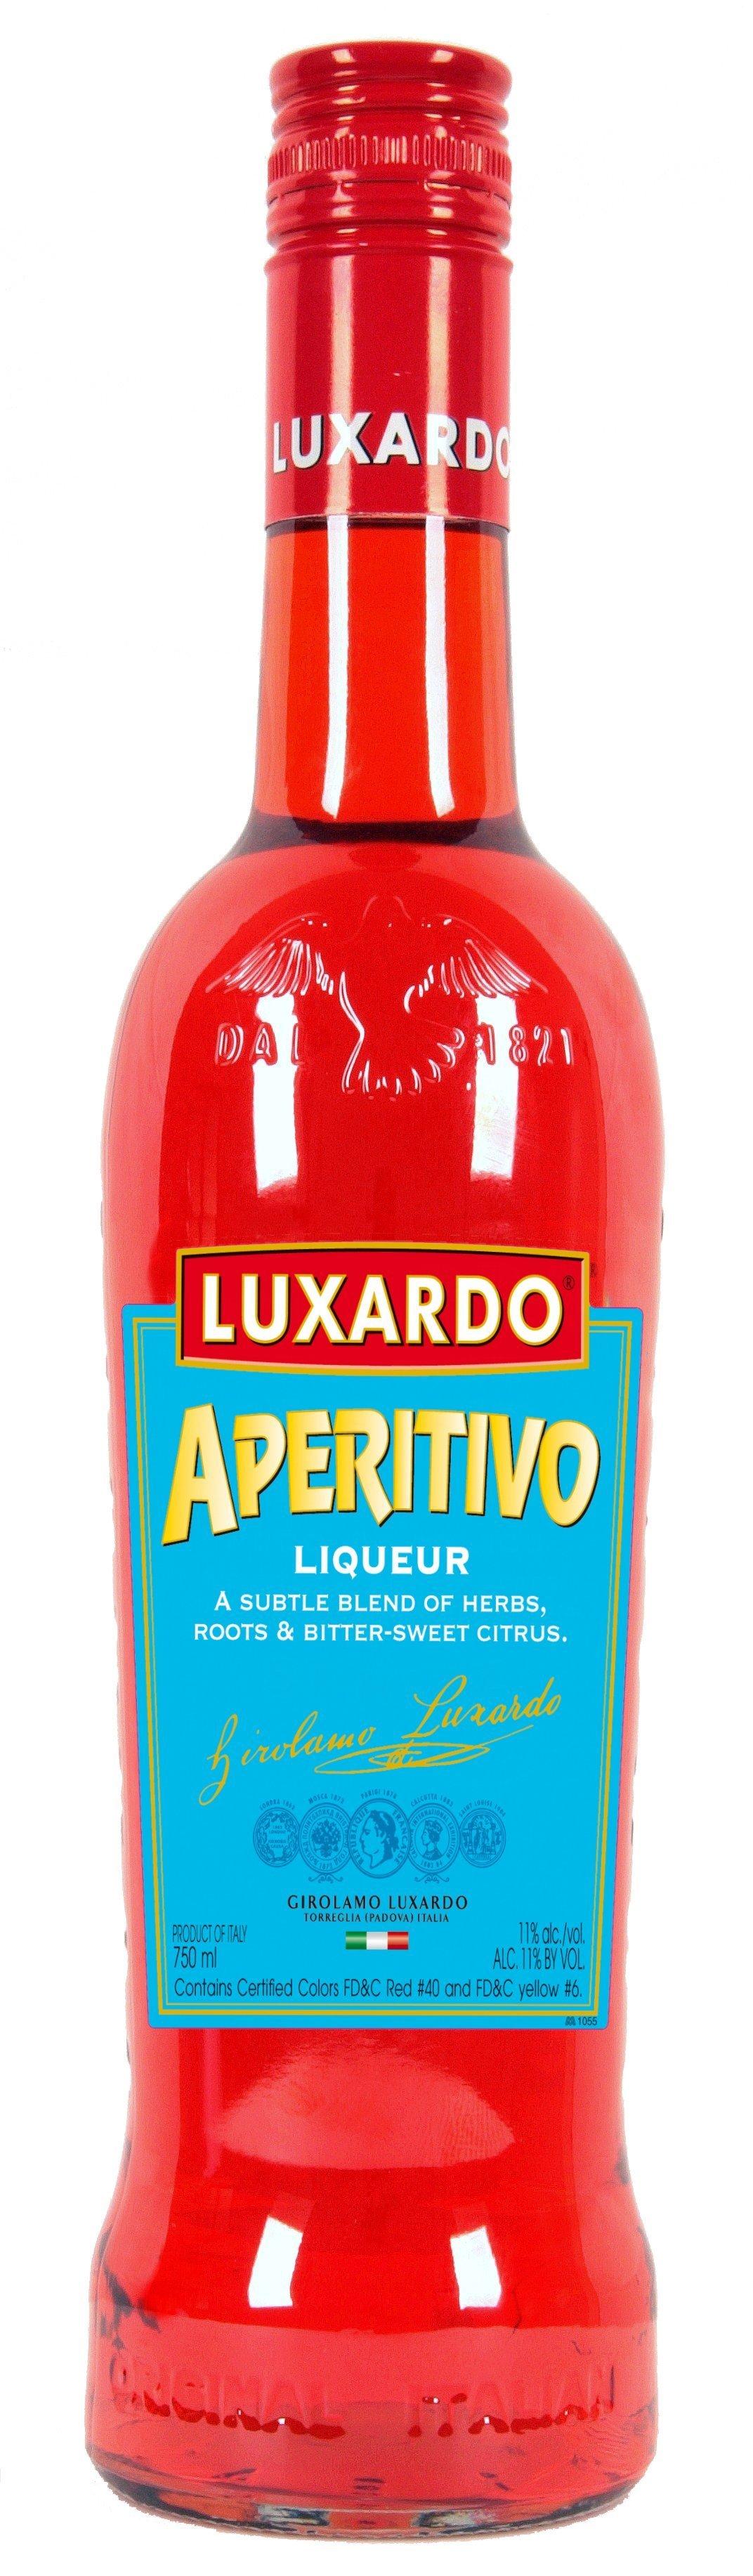 Luxardo aperitivo favorite spirits pinterest for Cocktail usa